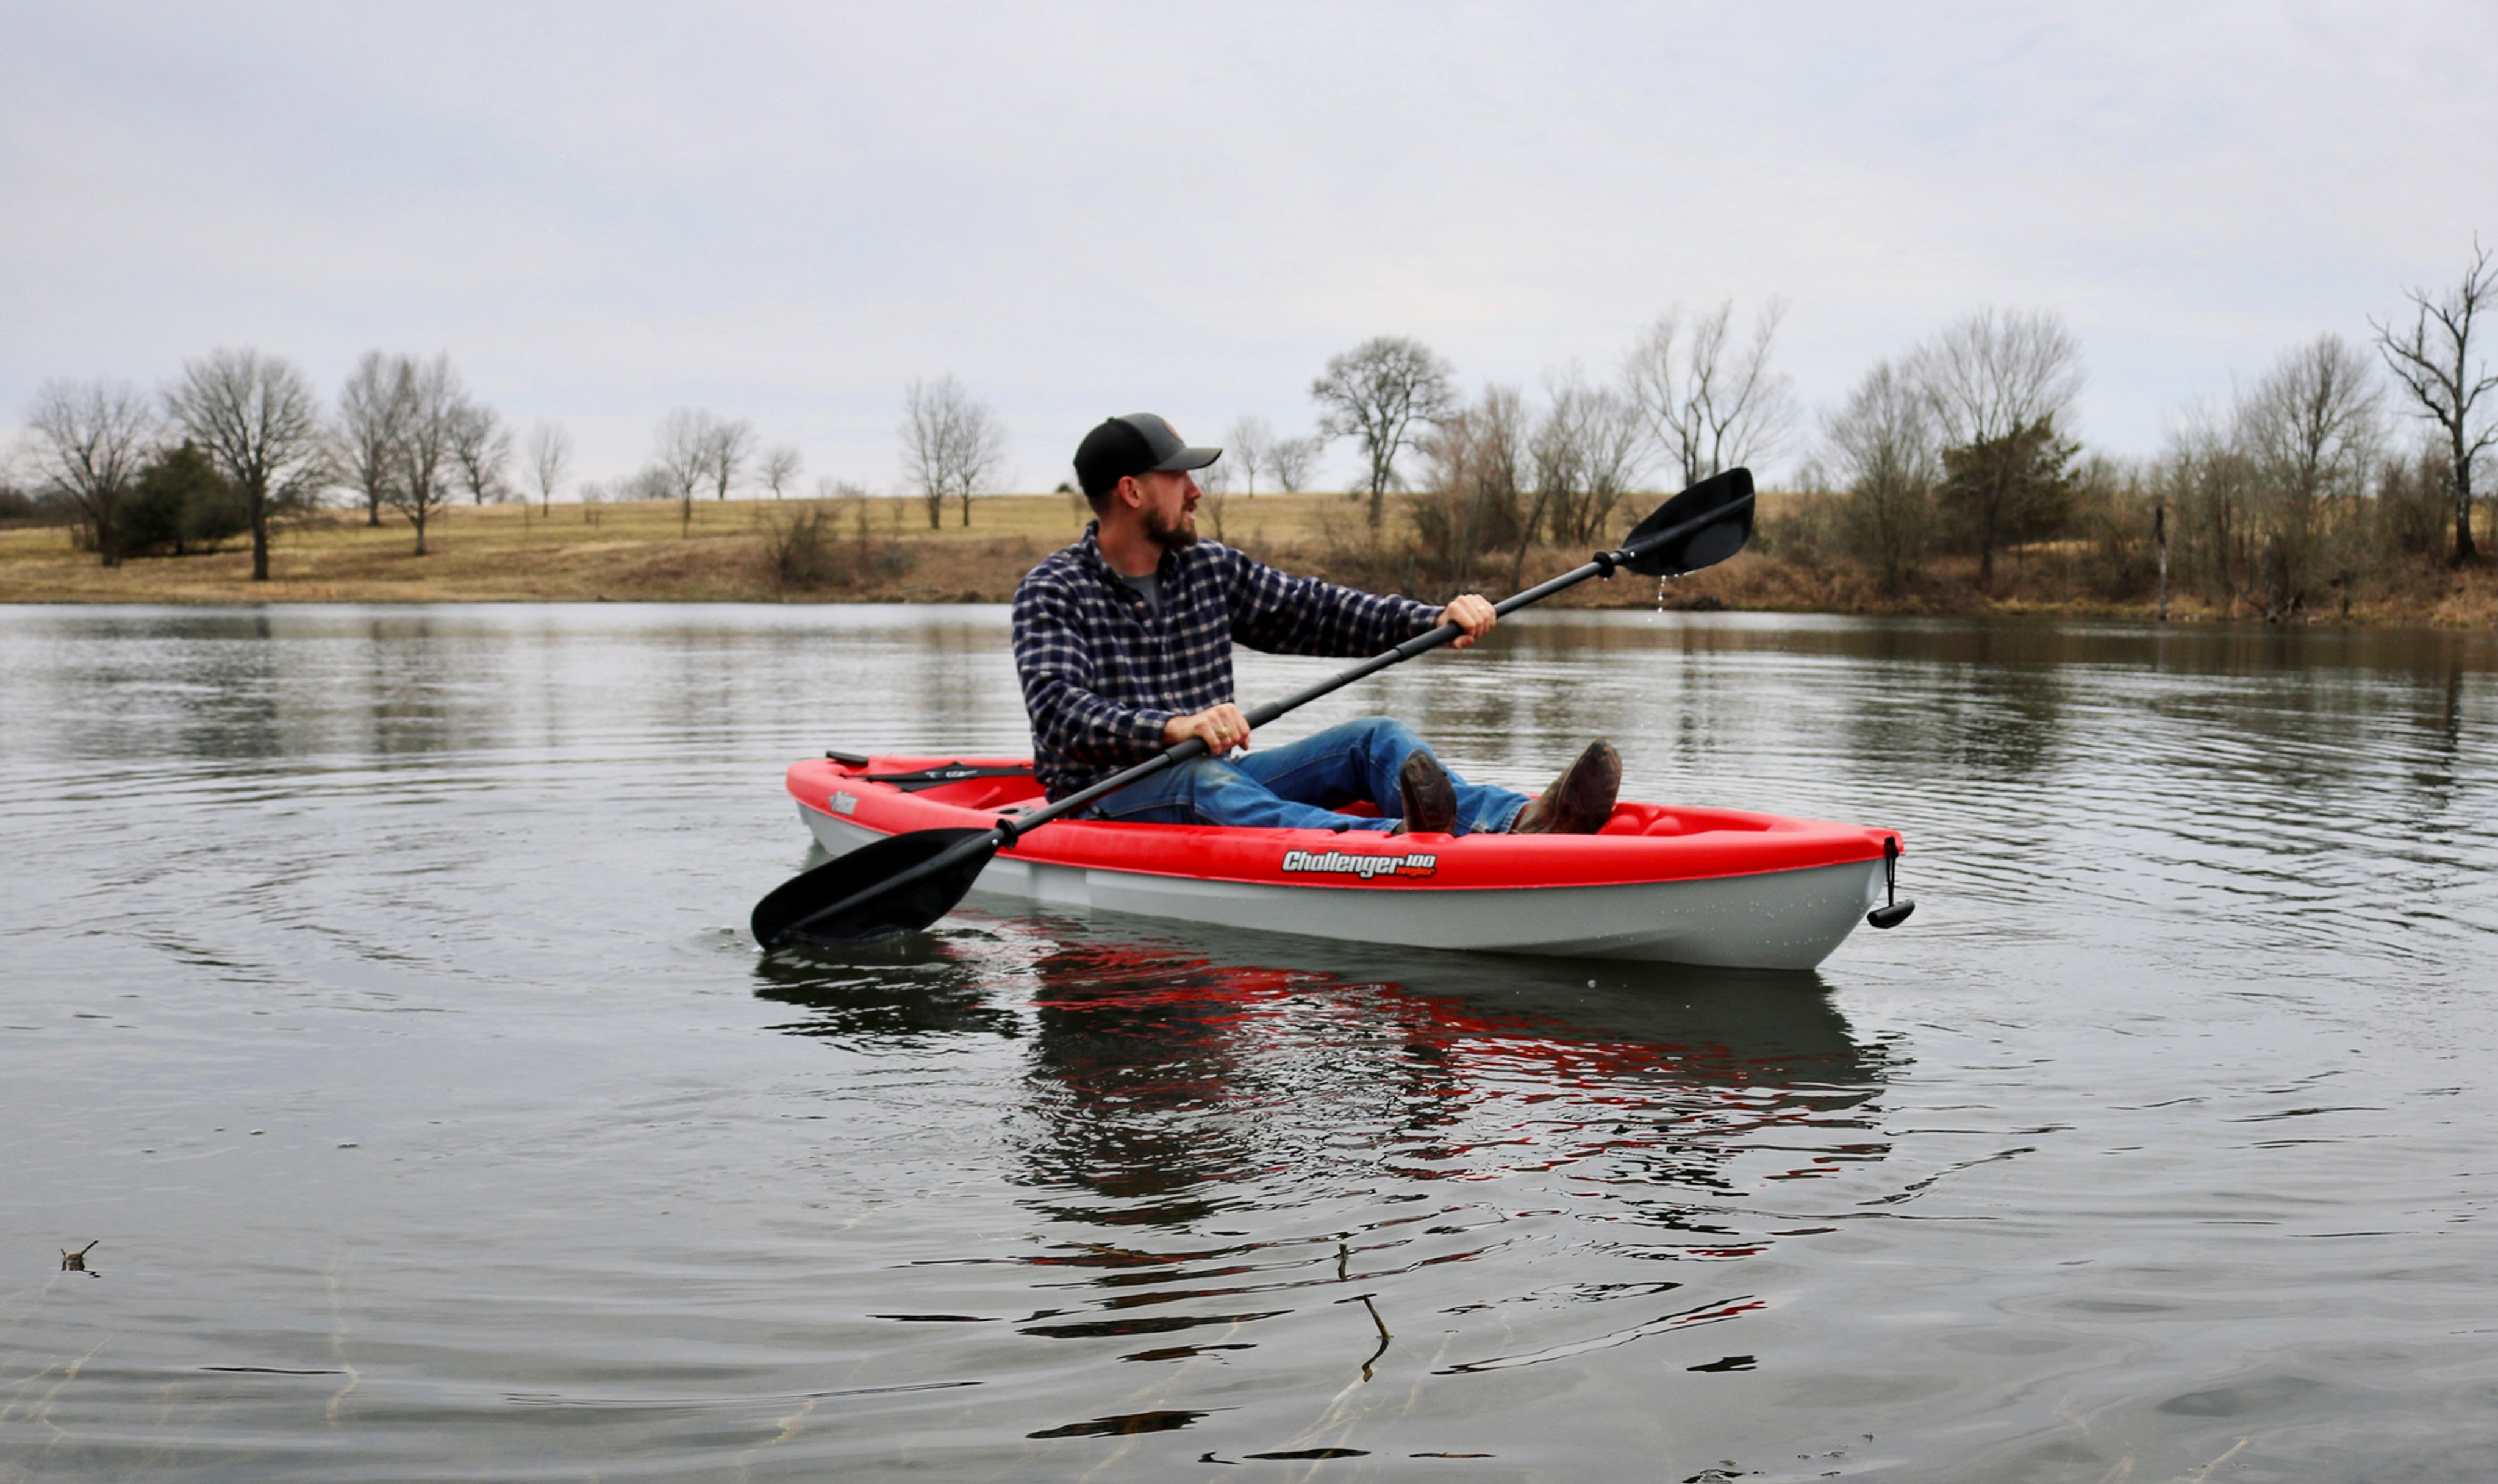 Kayak and Canoe Rentals